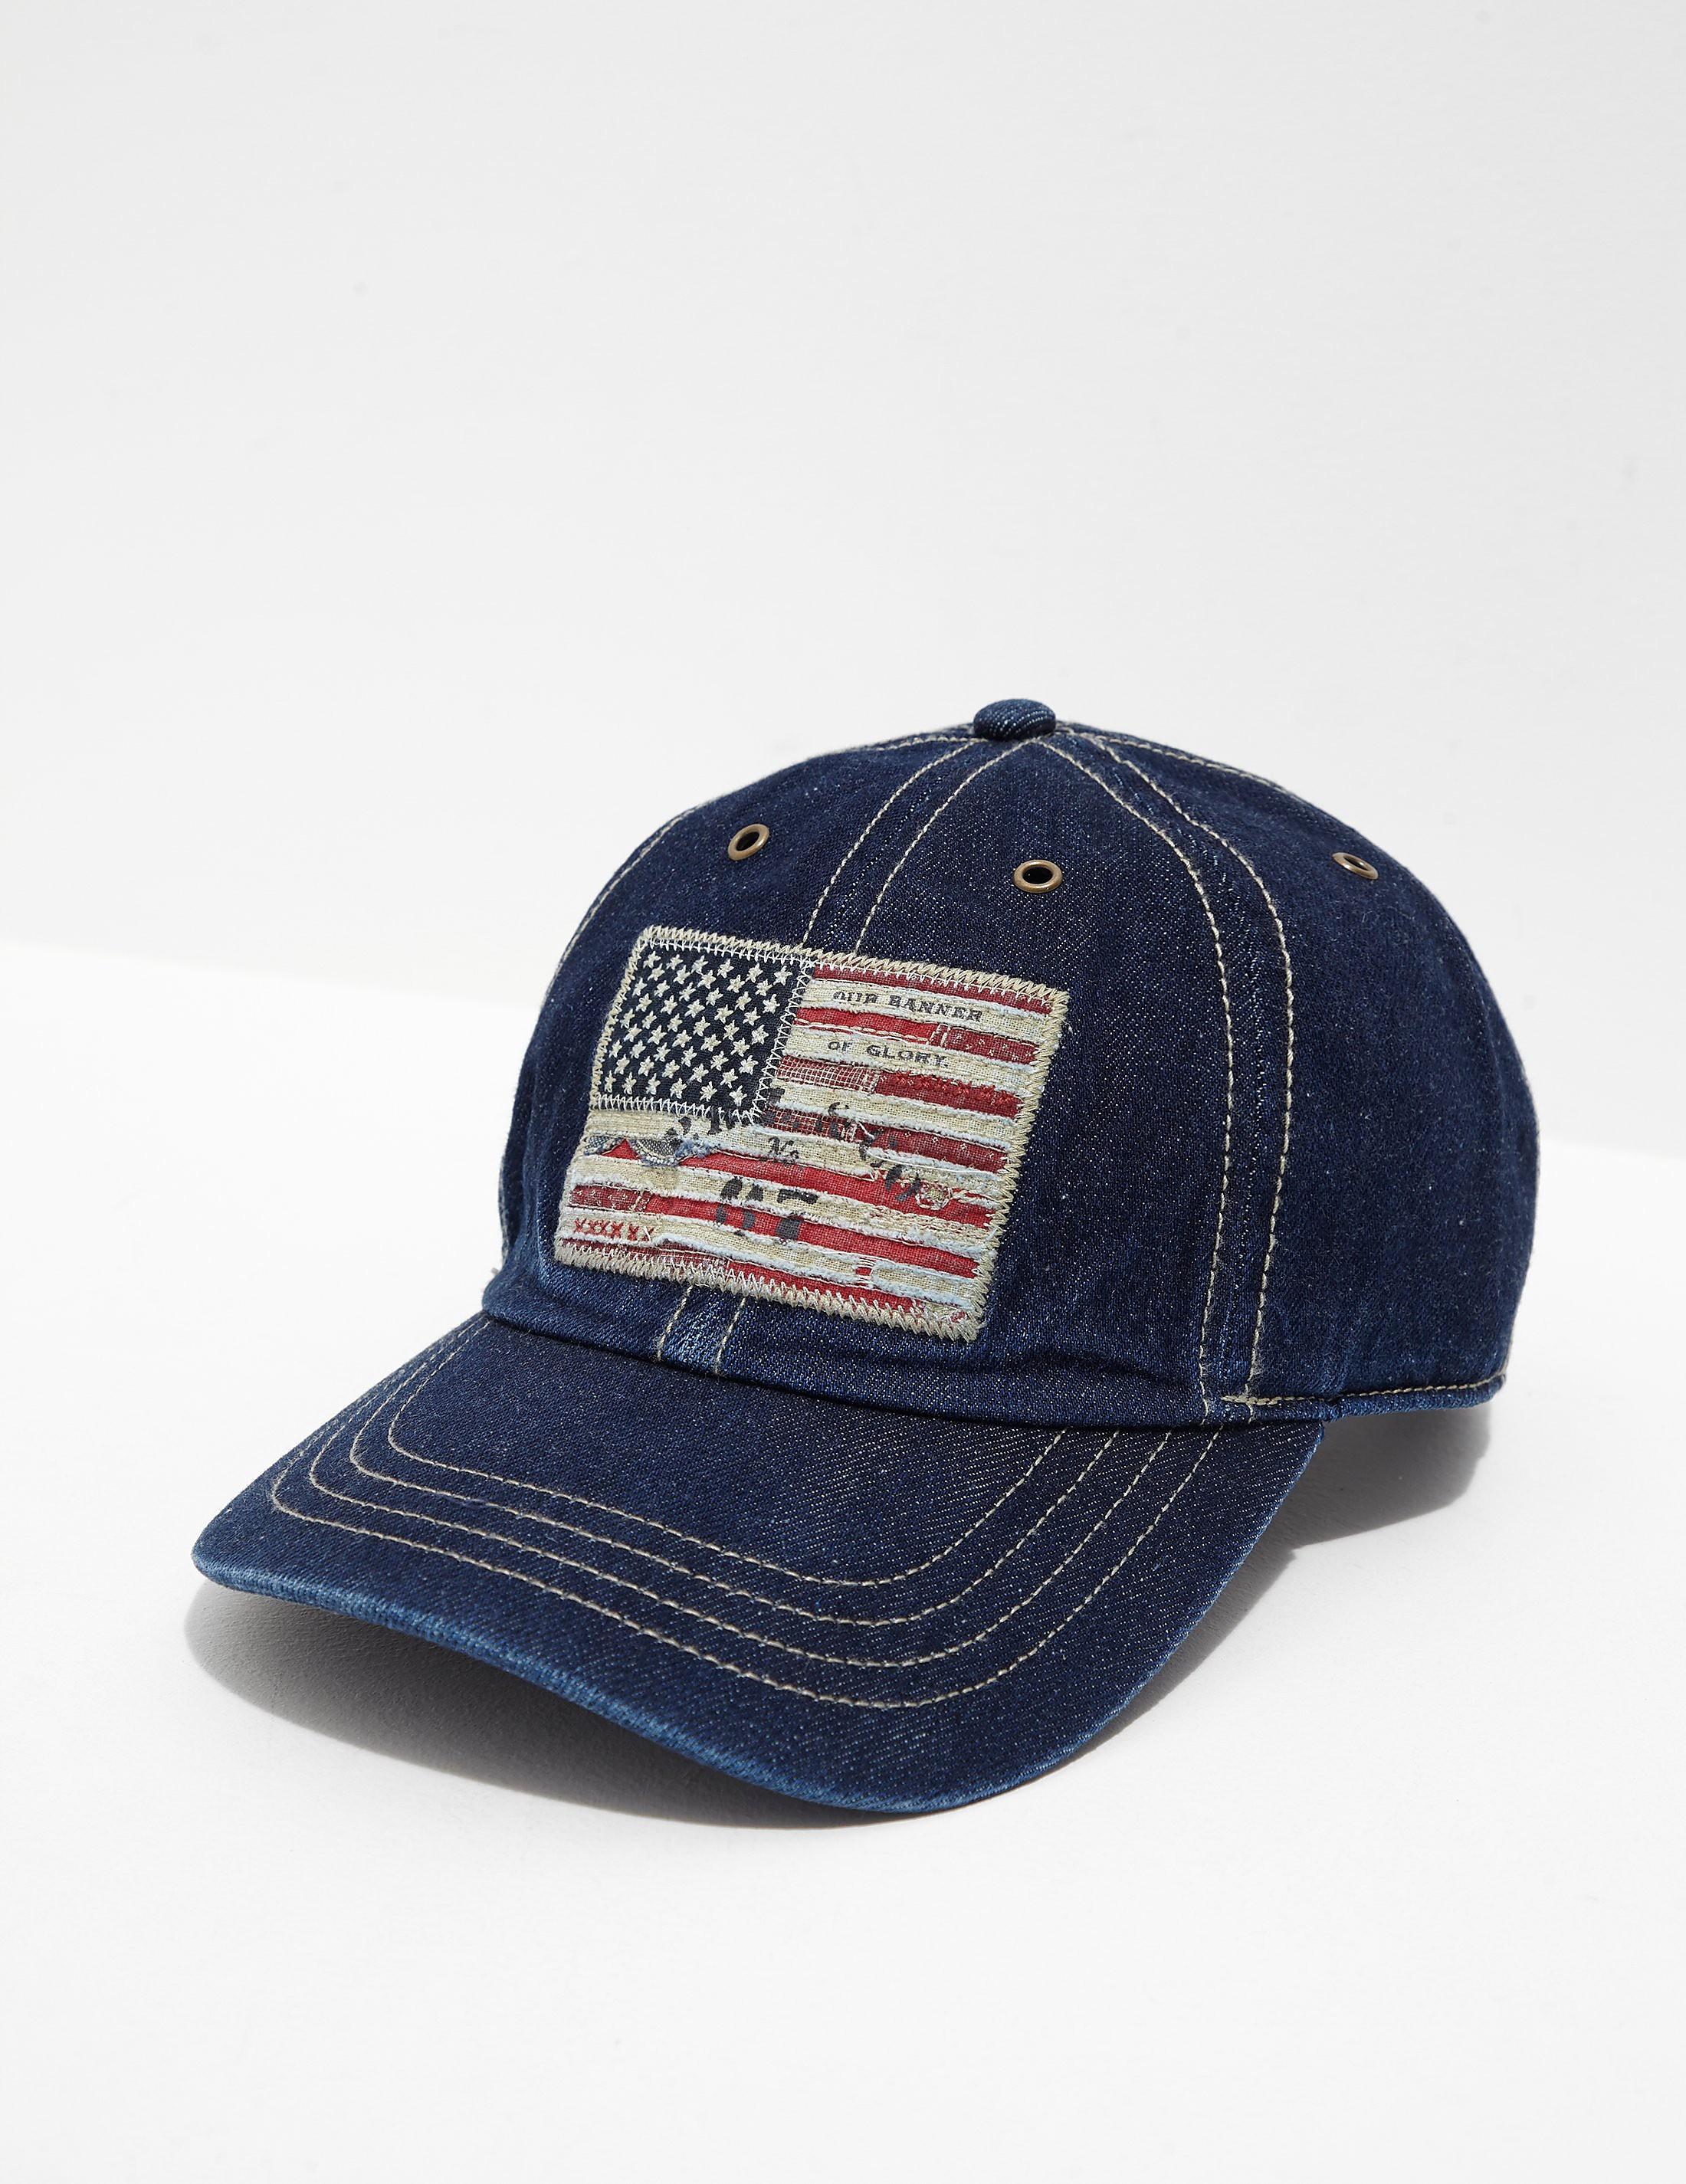 Polo Ralph Lauren Iconic Flag Cap